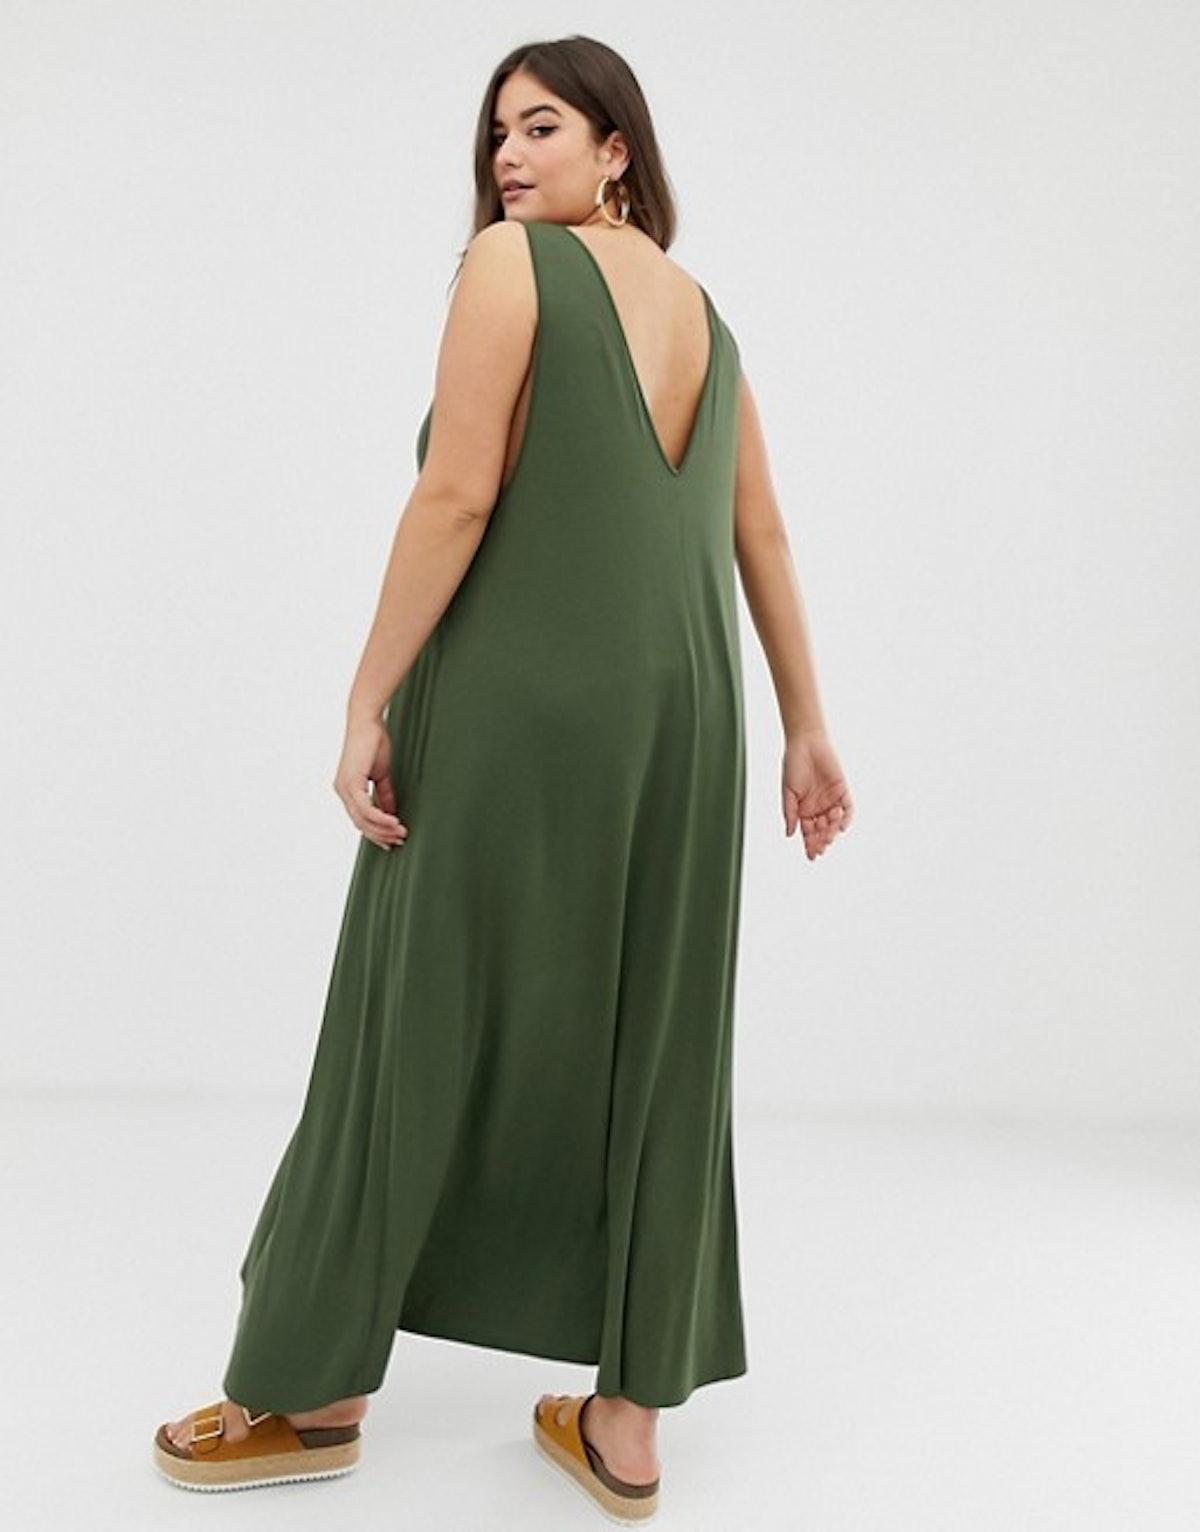 ASOS DESIGN Curve Plunge Trapeze Maxi Dress